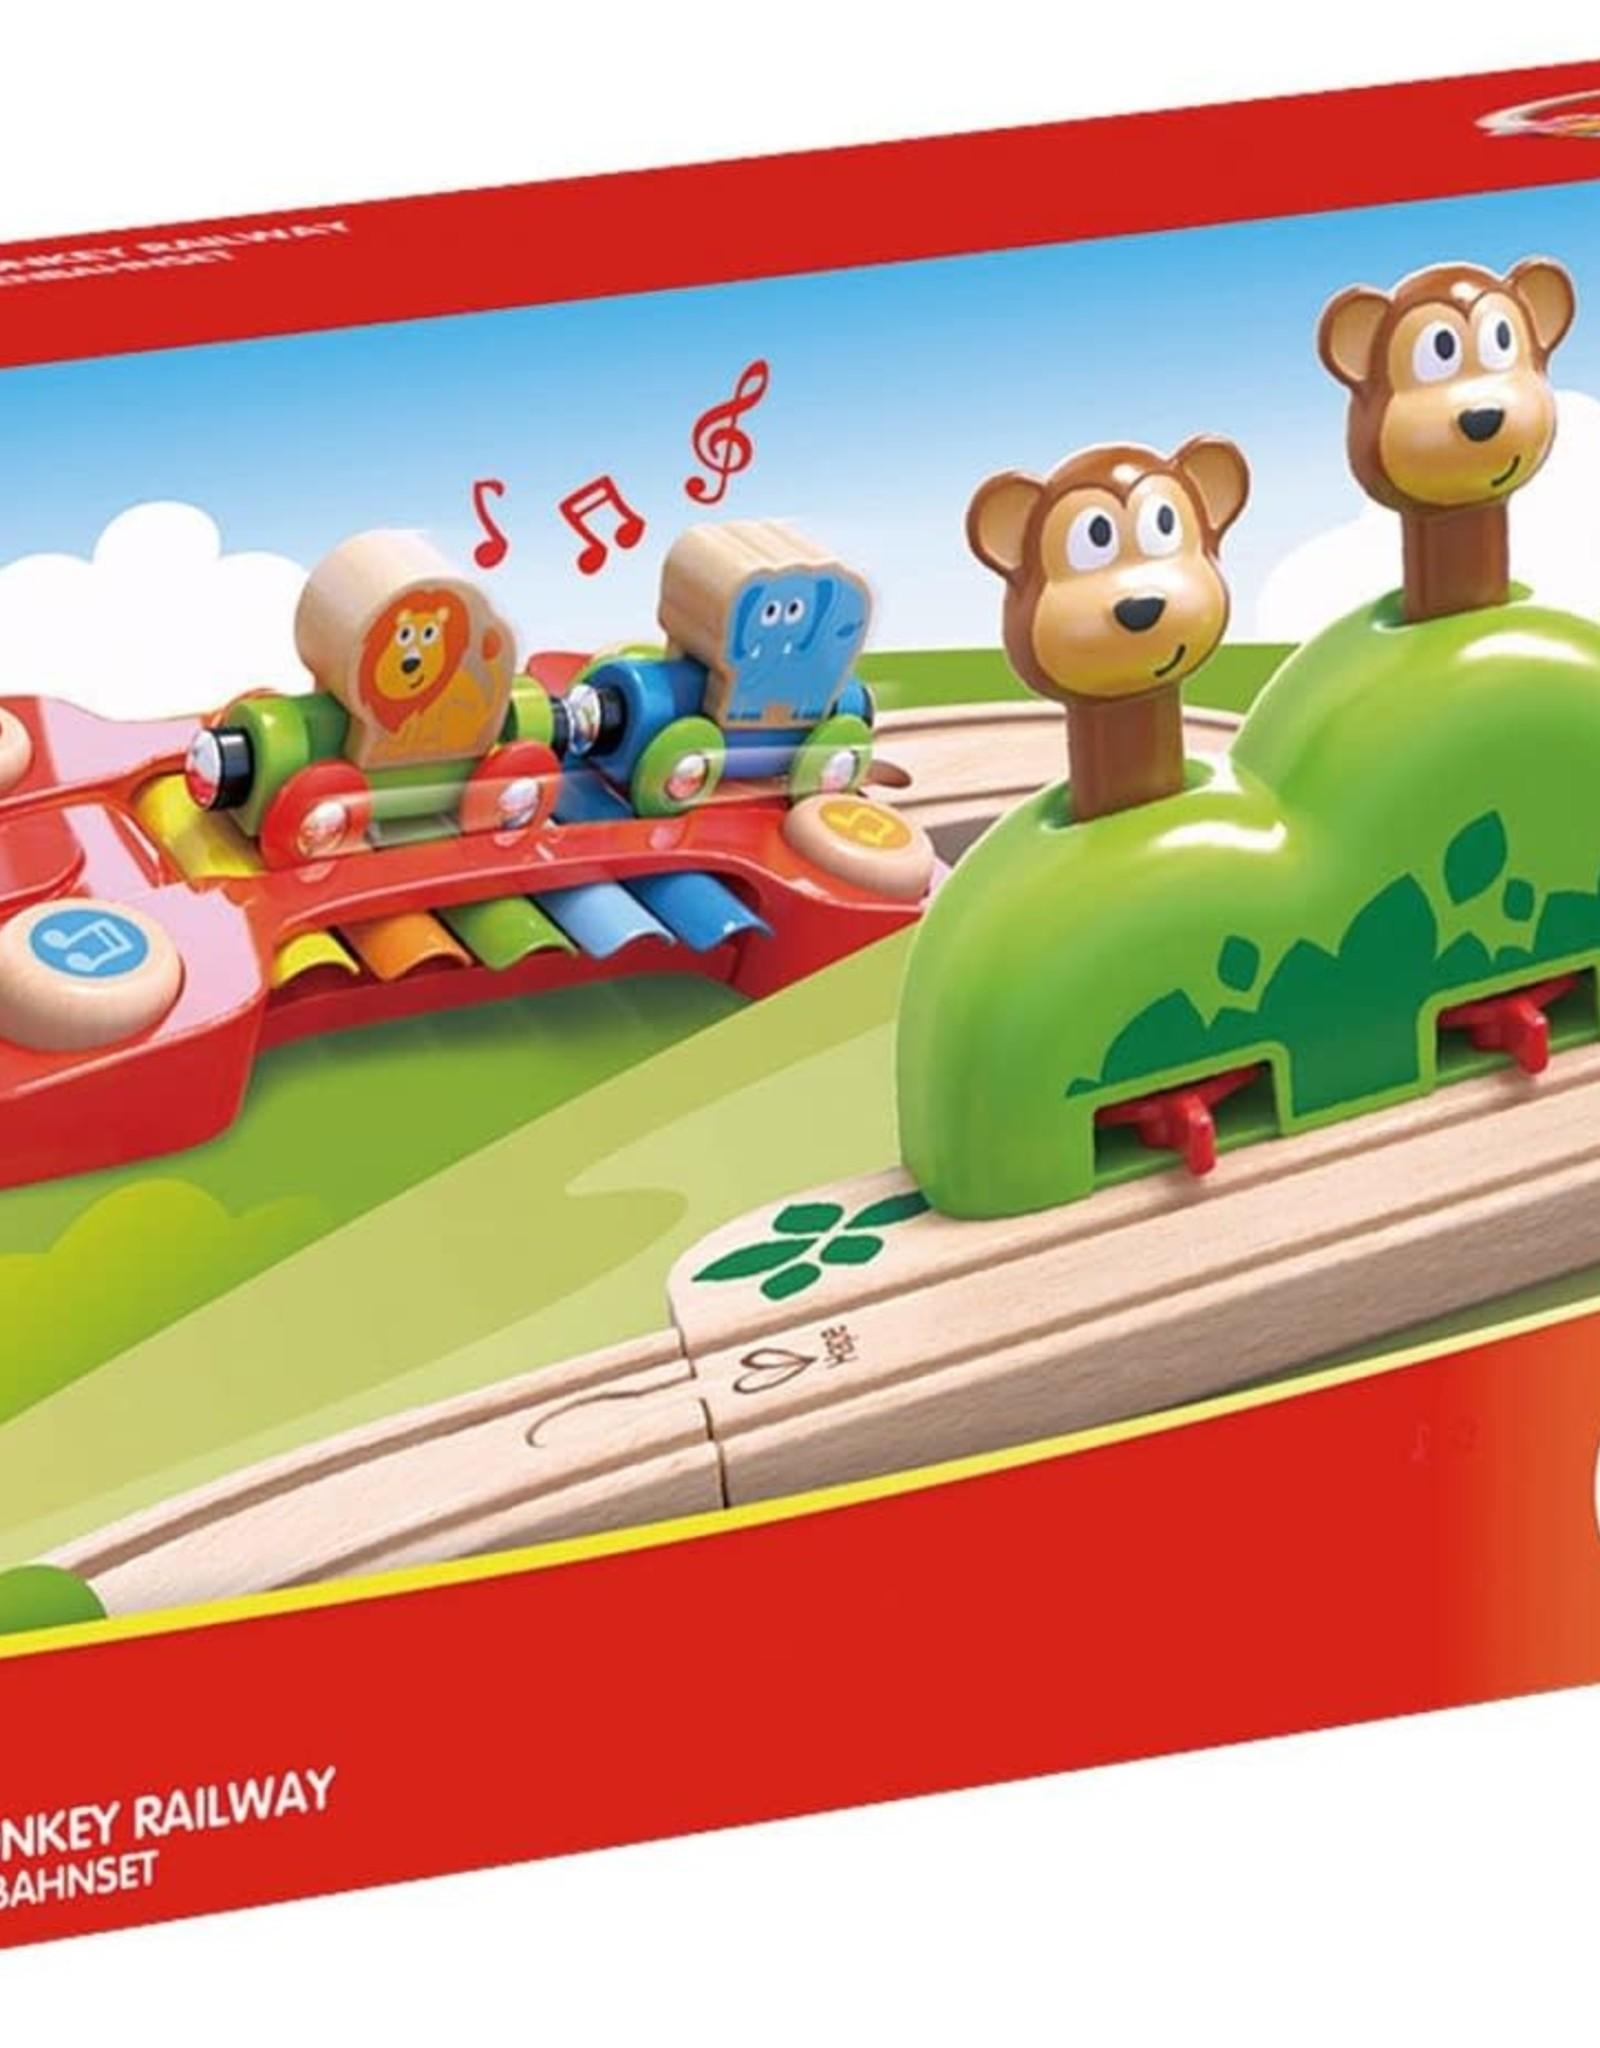 Hape Toys Hape Music and Monkey Railway